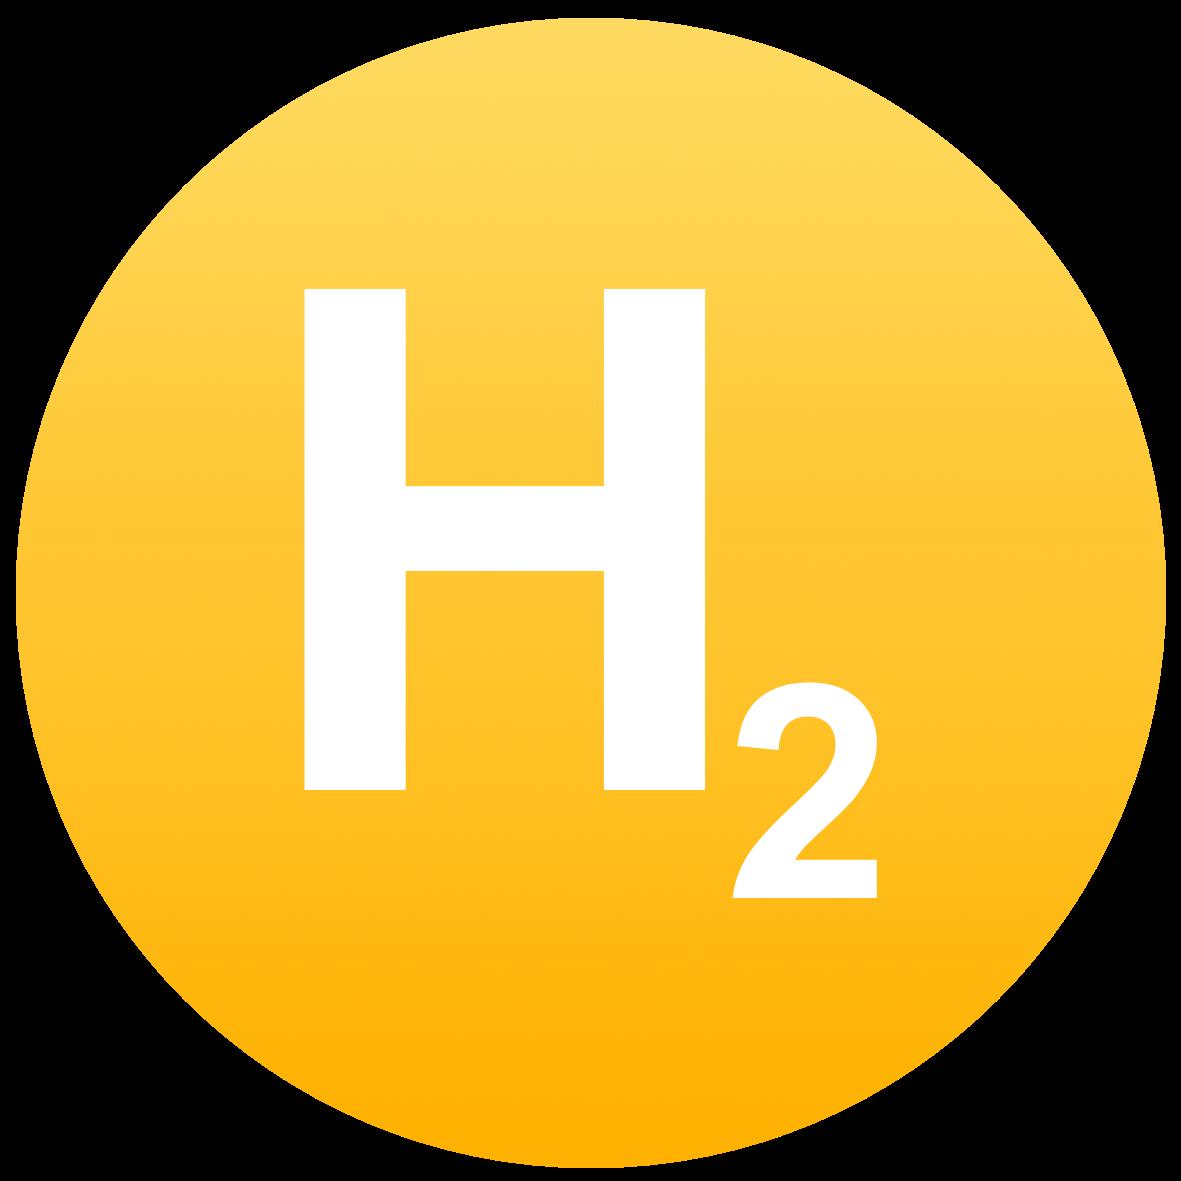 HydrogenLogo